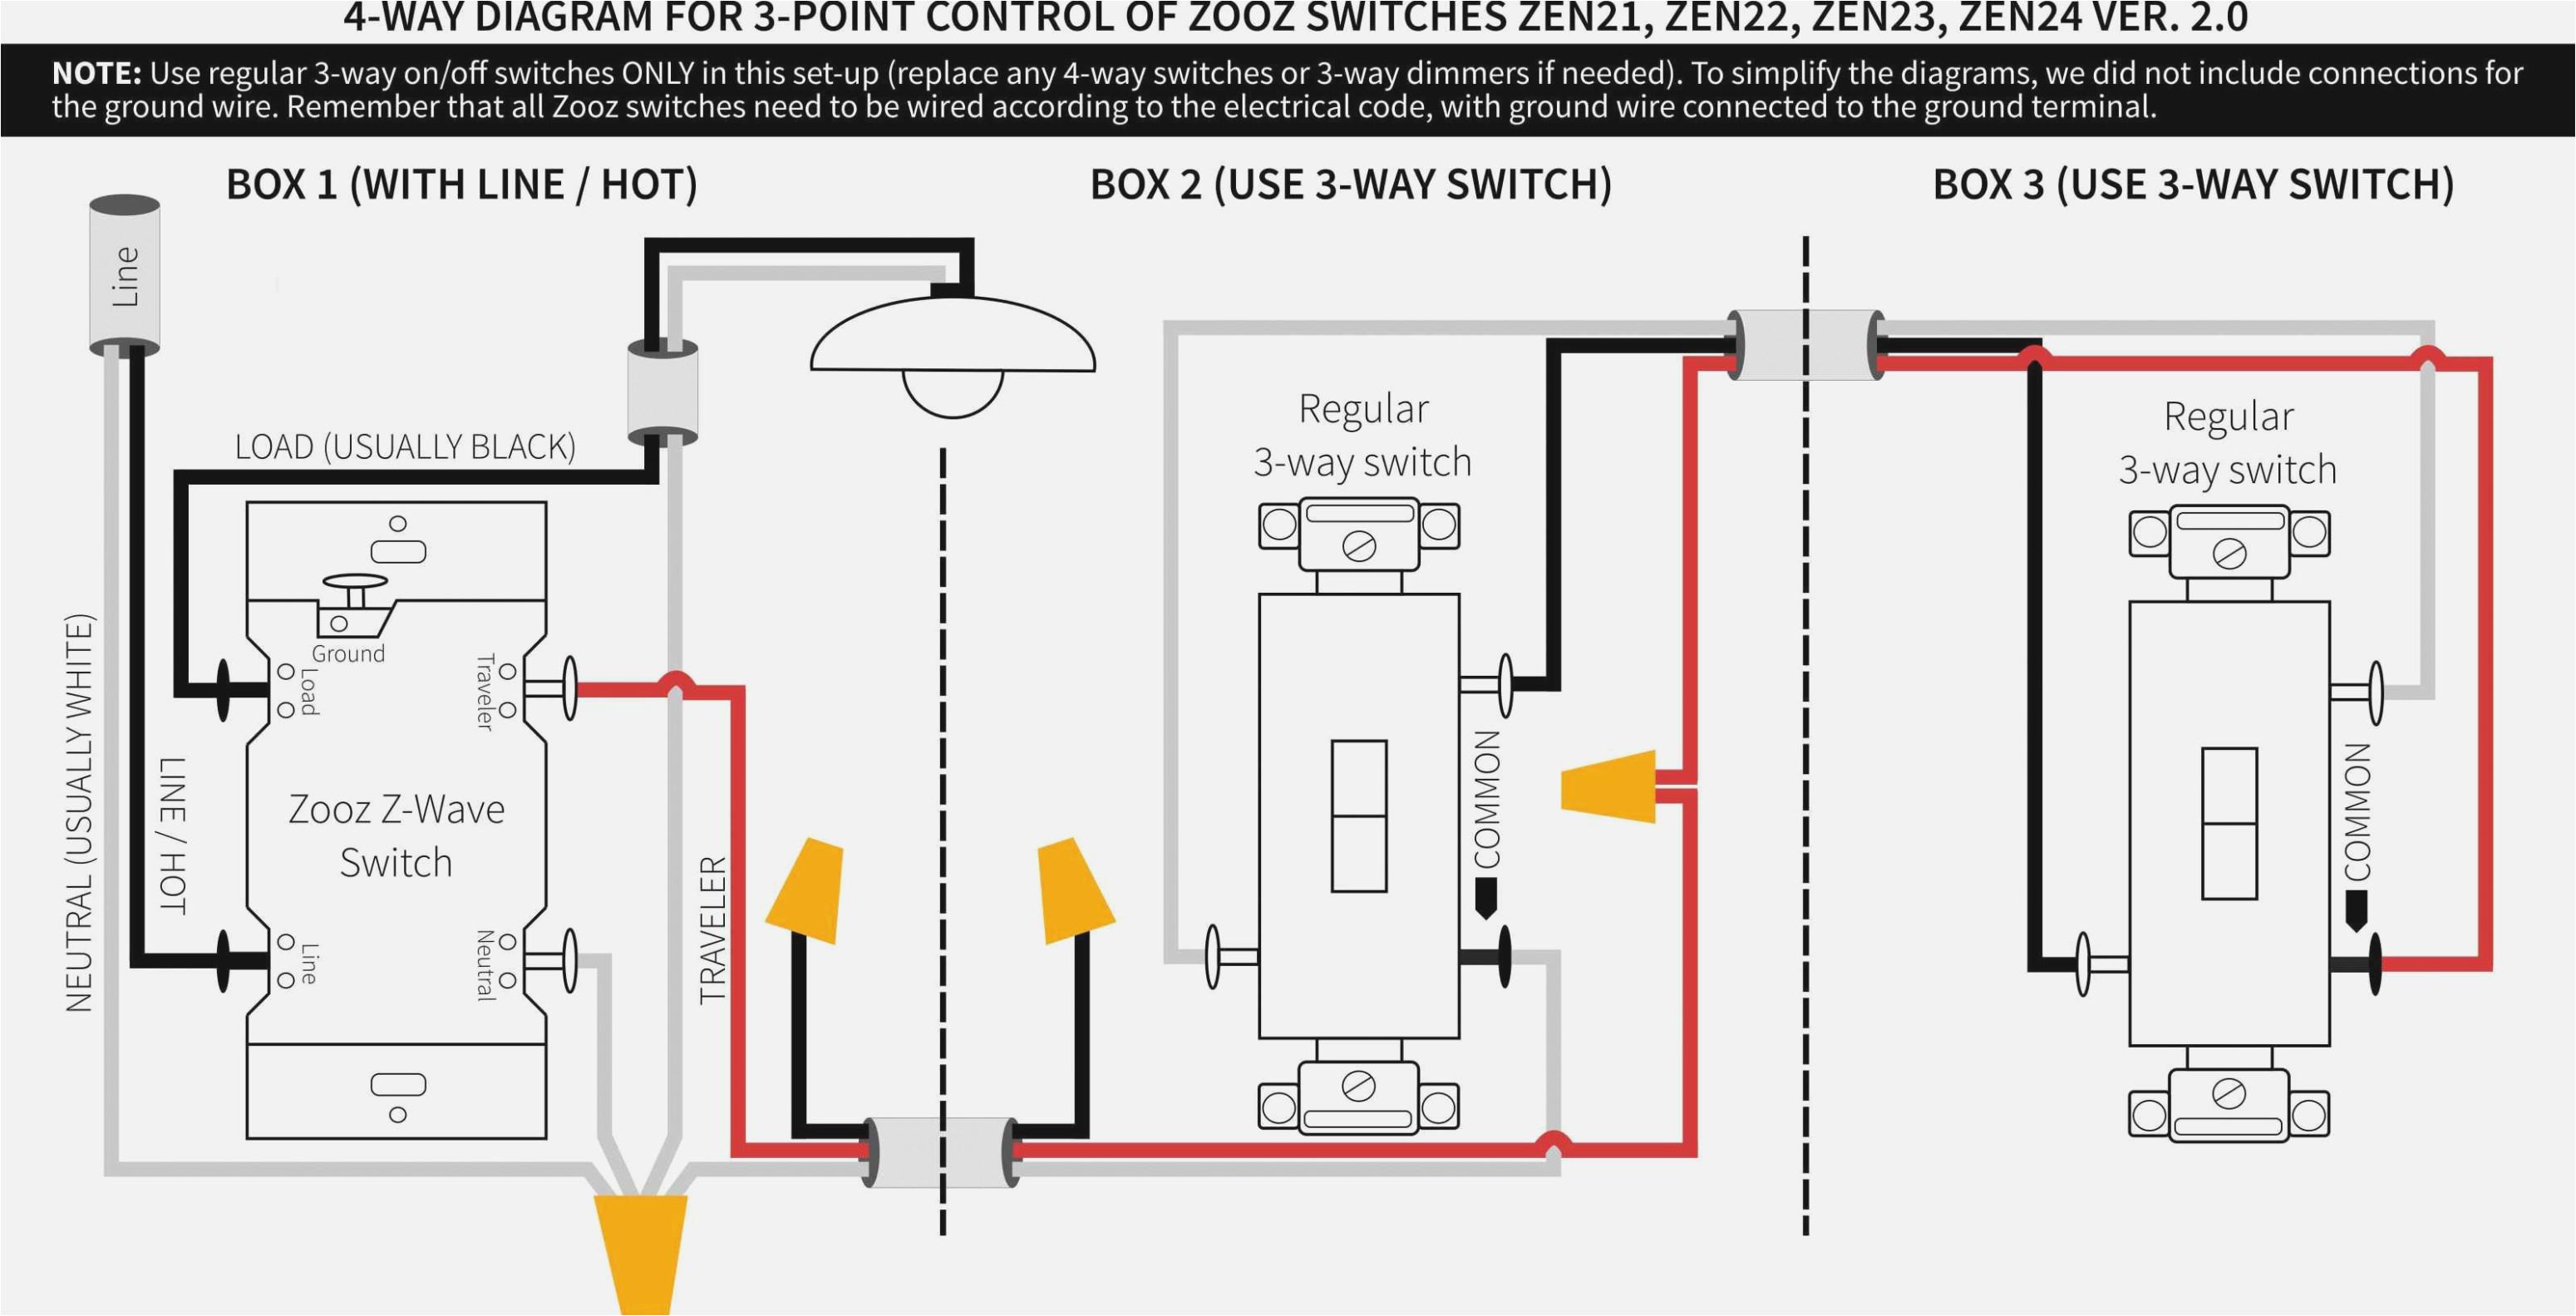 lutron 4 way switch diagram wiring diagram expert lutron maestro 4 way dimmer wiring diagram lutron 4 way dimmer wiring diagram